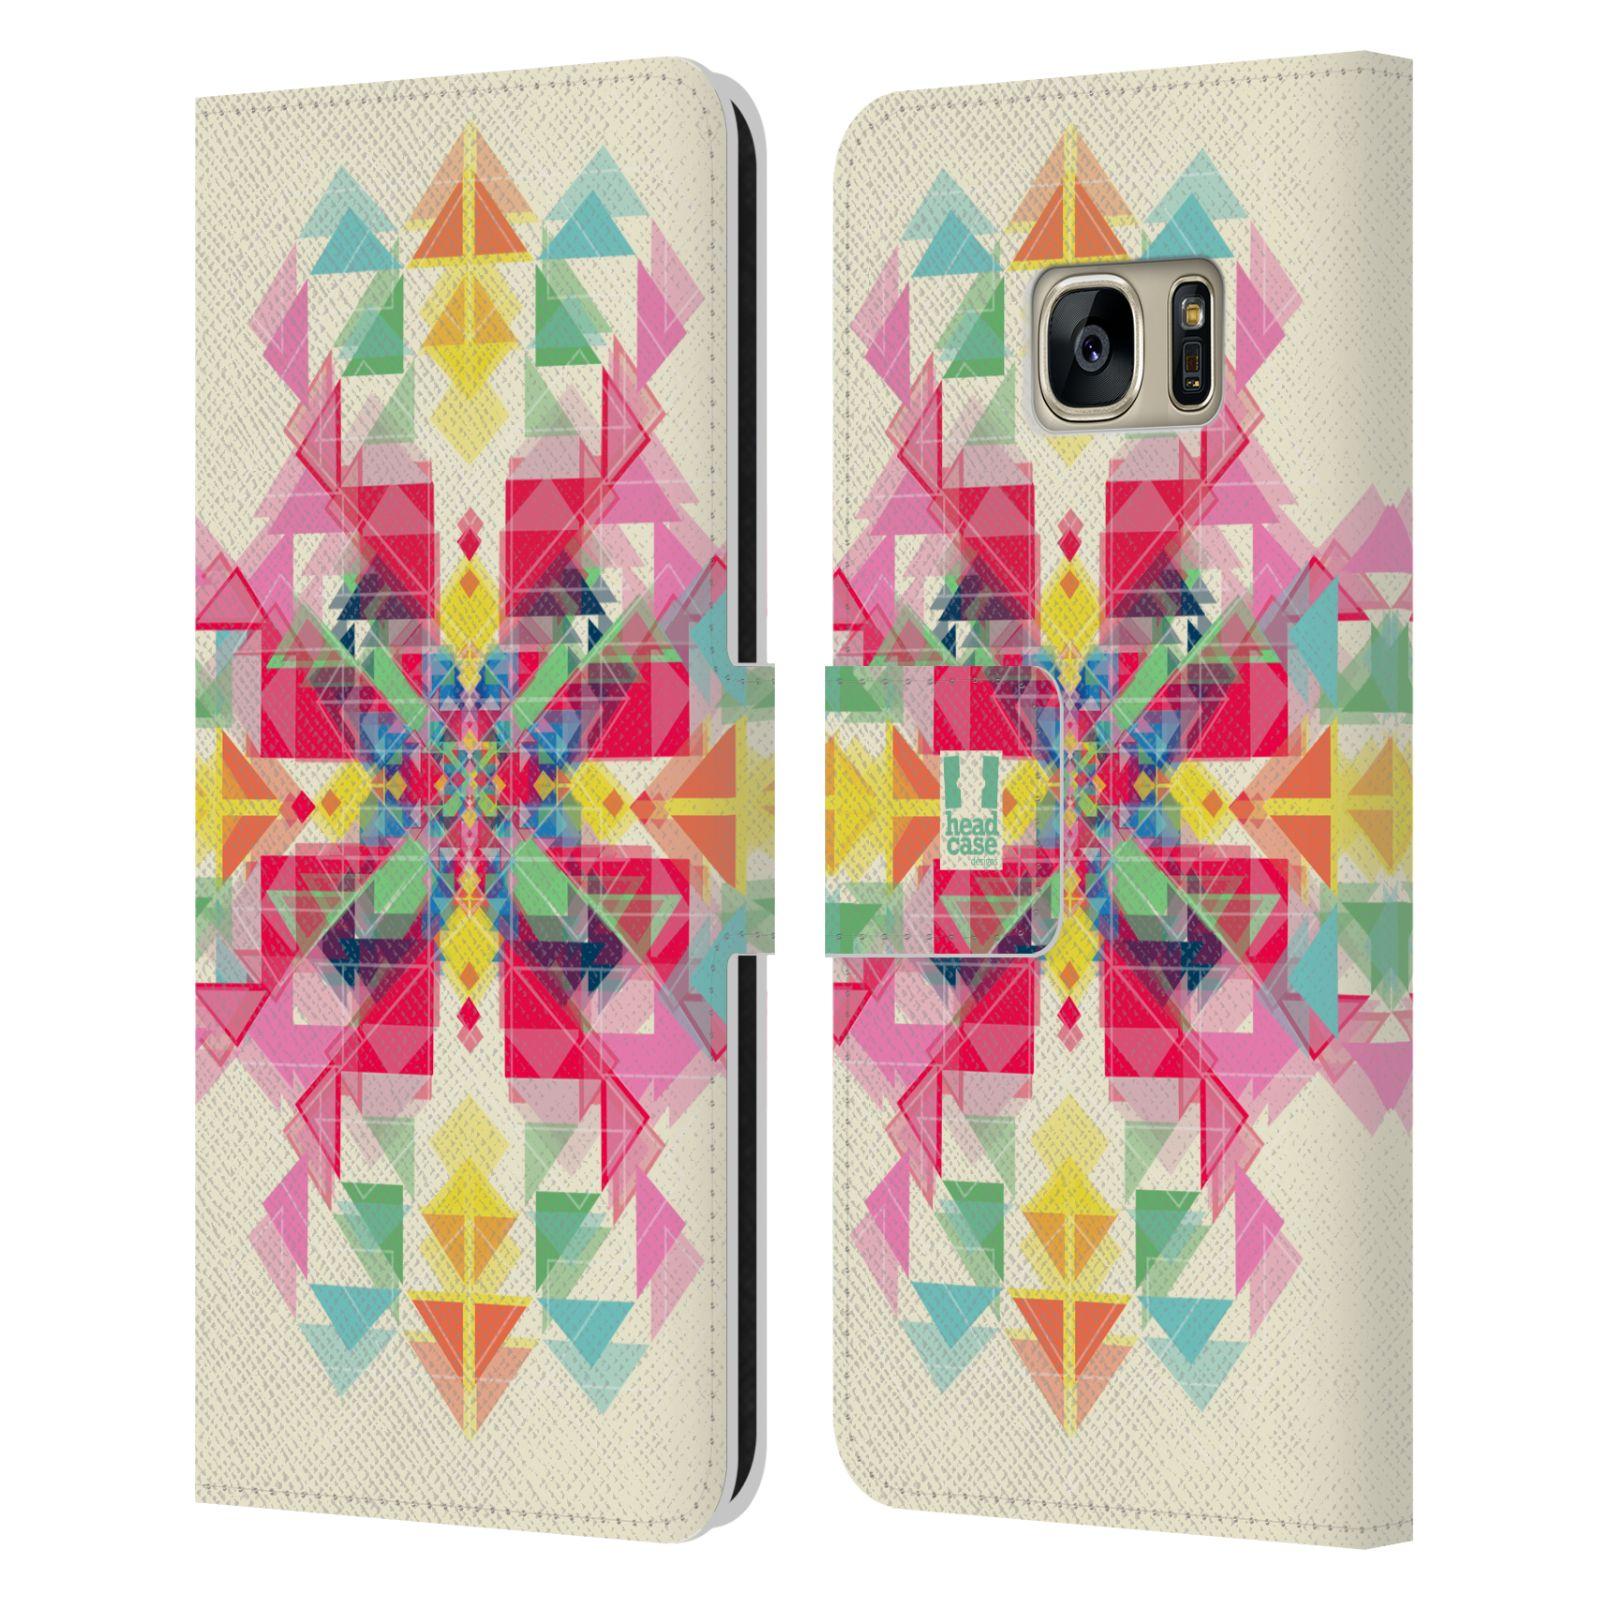 HEAD CASE Flipové pouzdro pro mobil Samsung Galaxy S7 (G9300) kaleidoskop abstraktní trojúhelníky barevný vzor